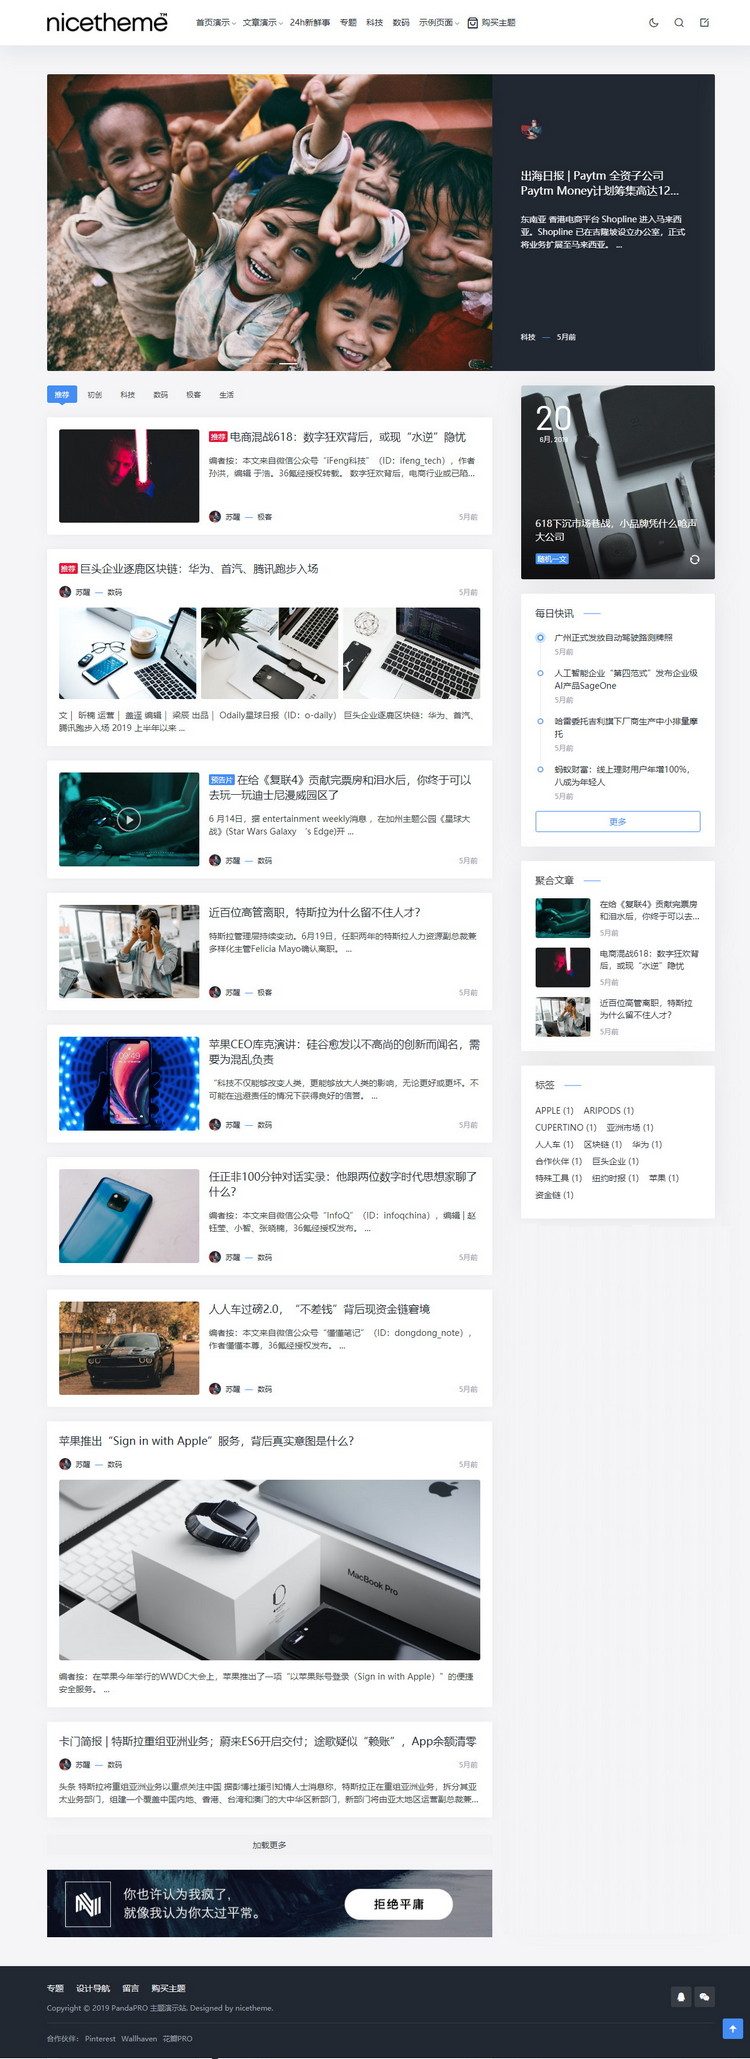 WordPress主题推荐之昼夜双色博客主题 Panda PRO